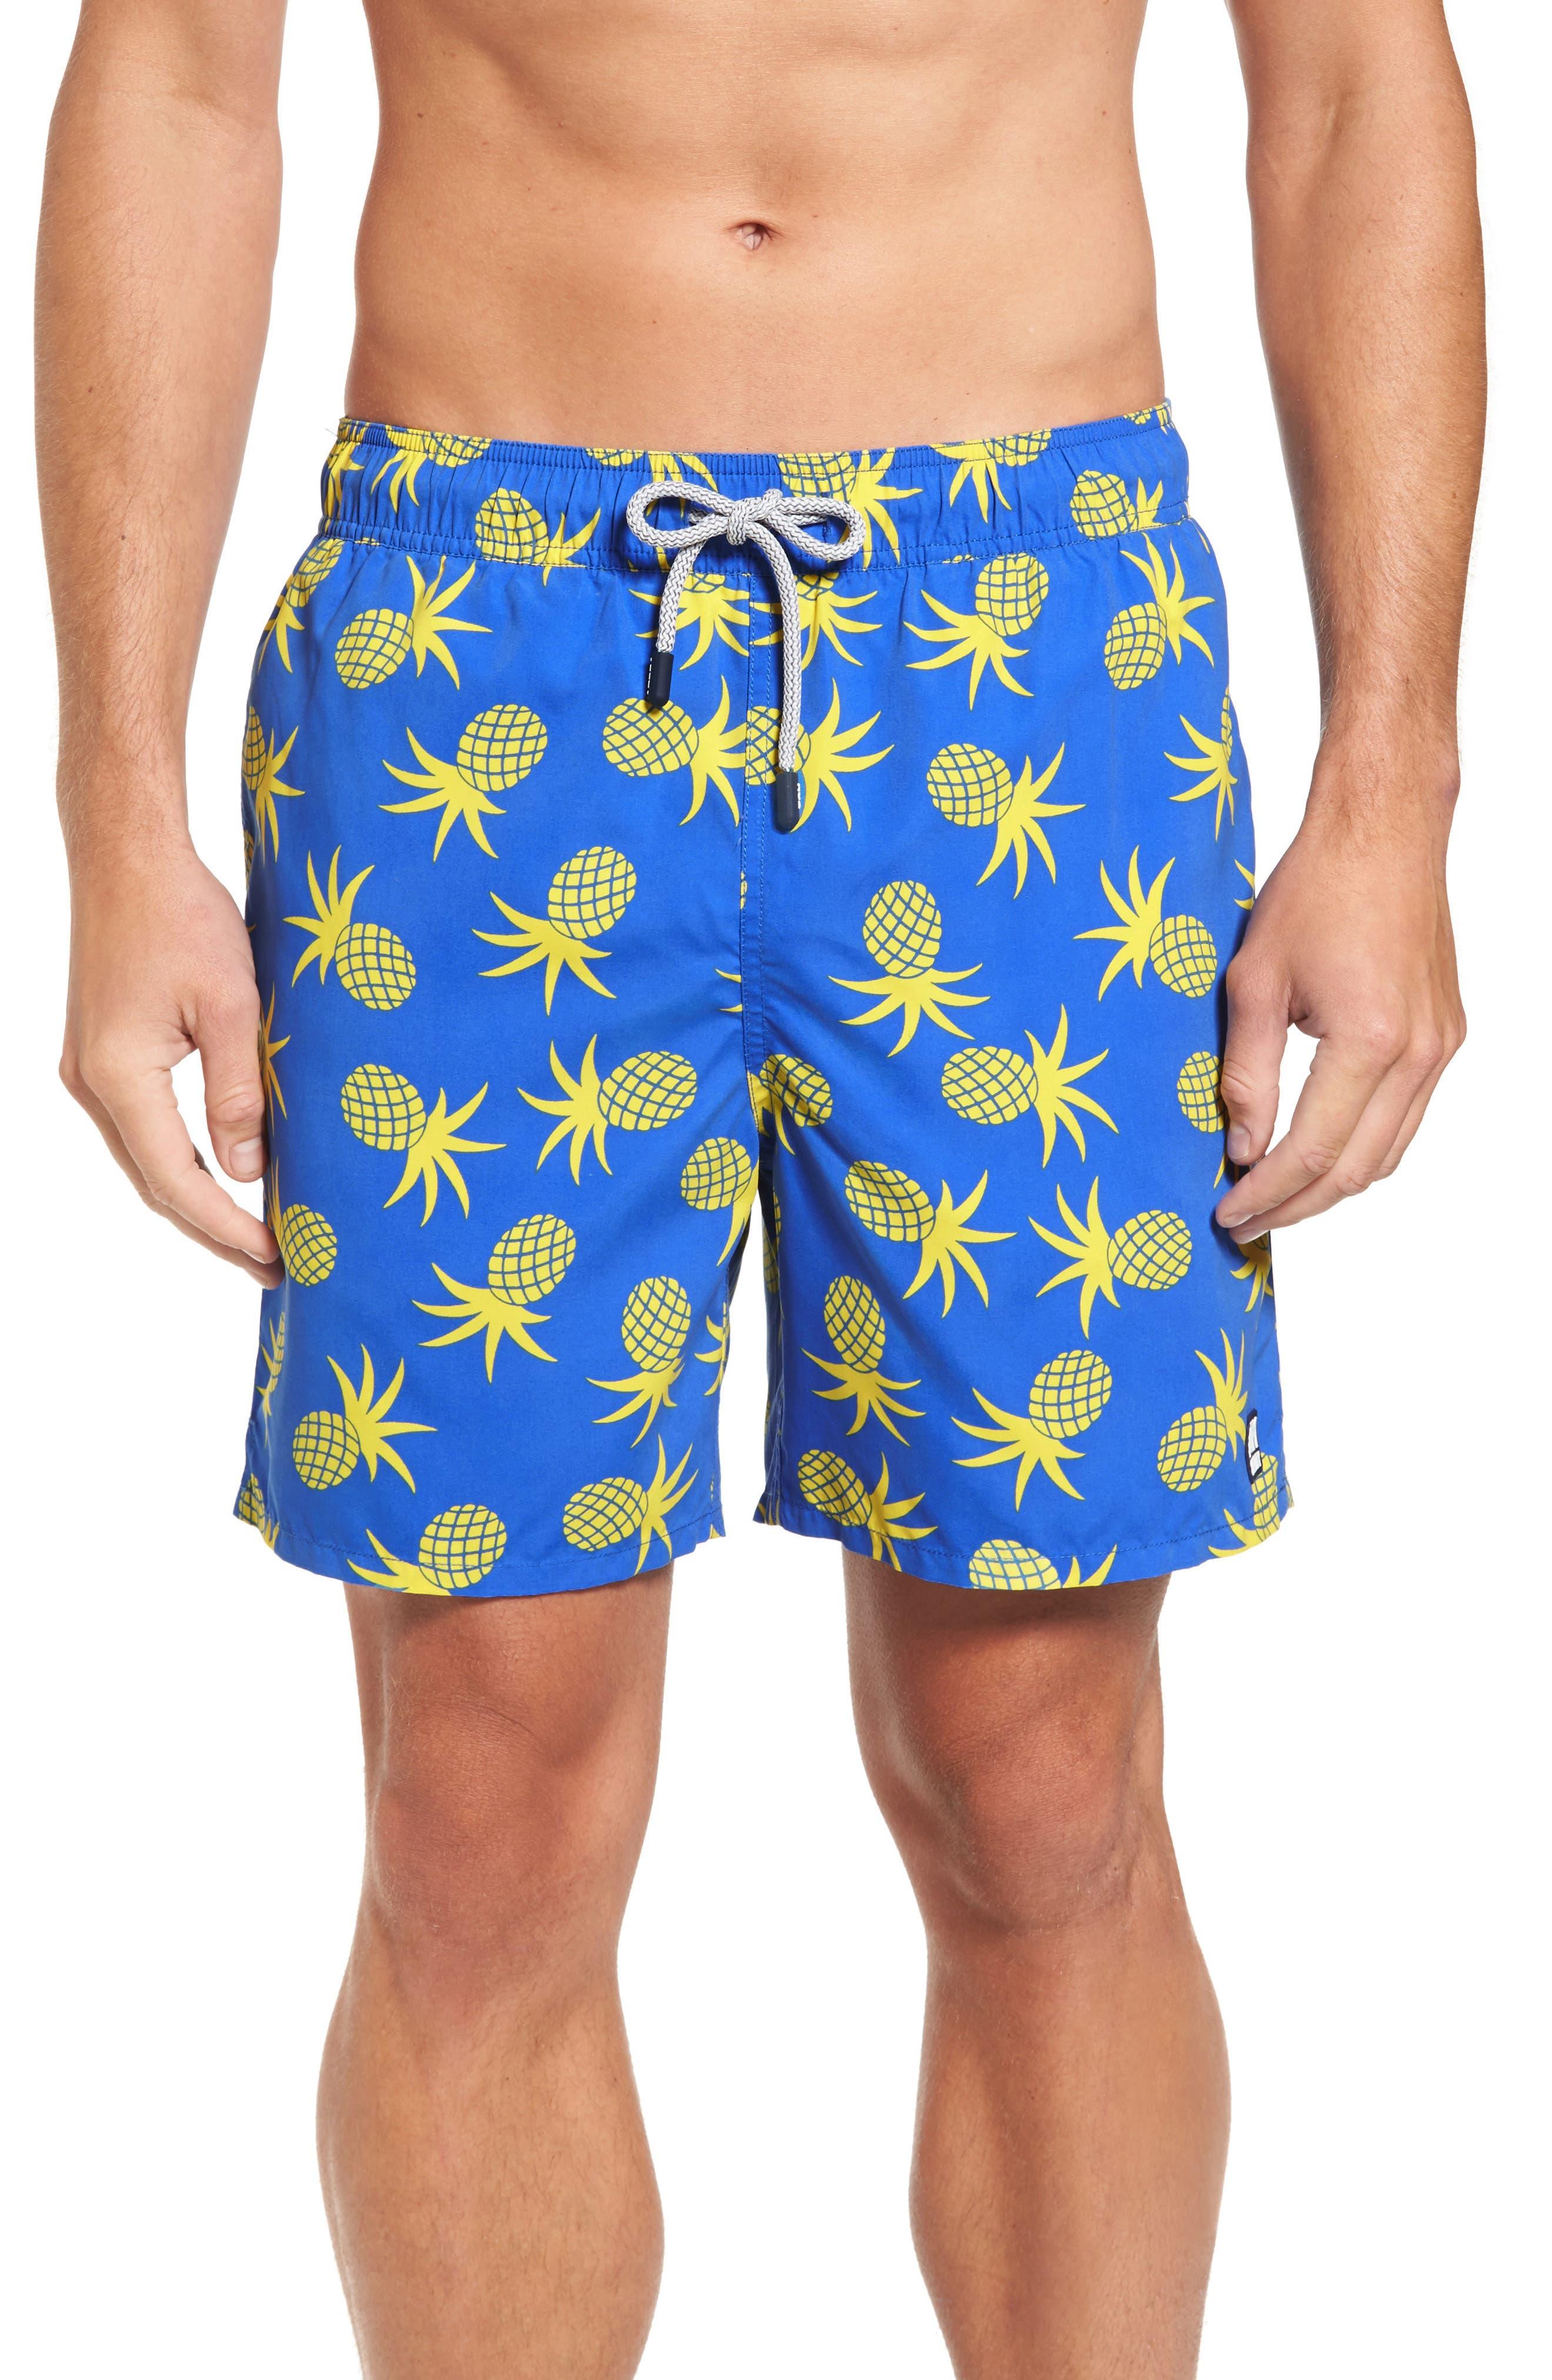 Pineapple Swim Trunks,                             Main thumbnail 1, color,                             430